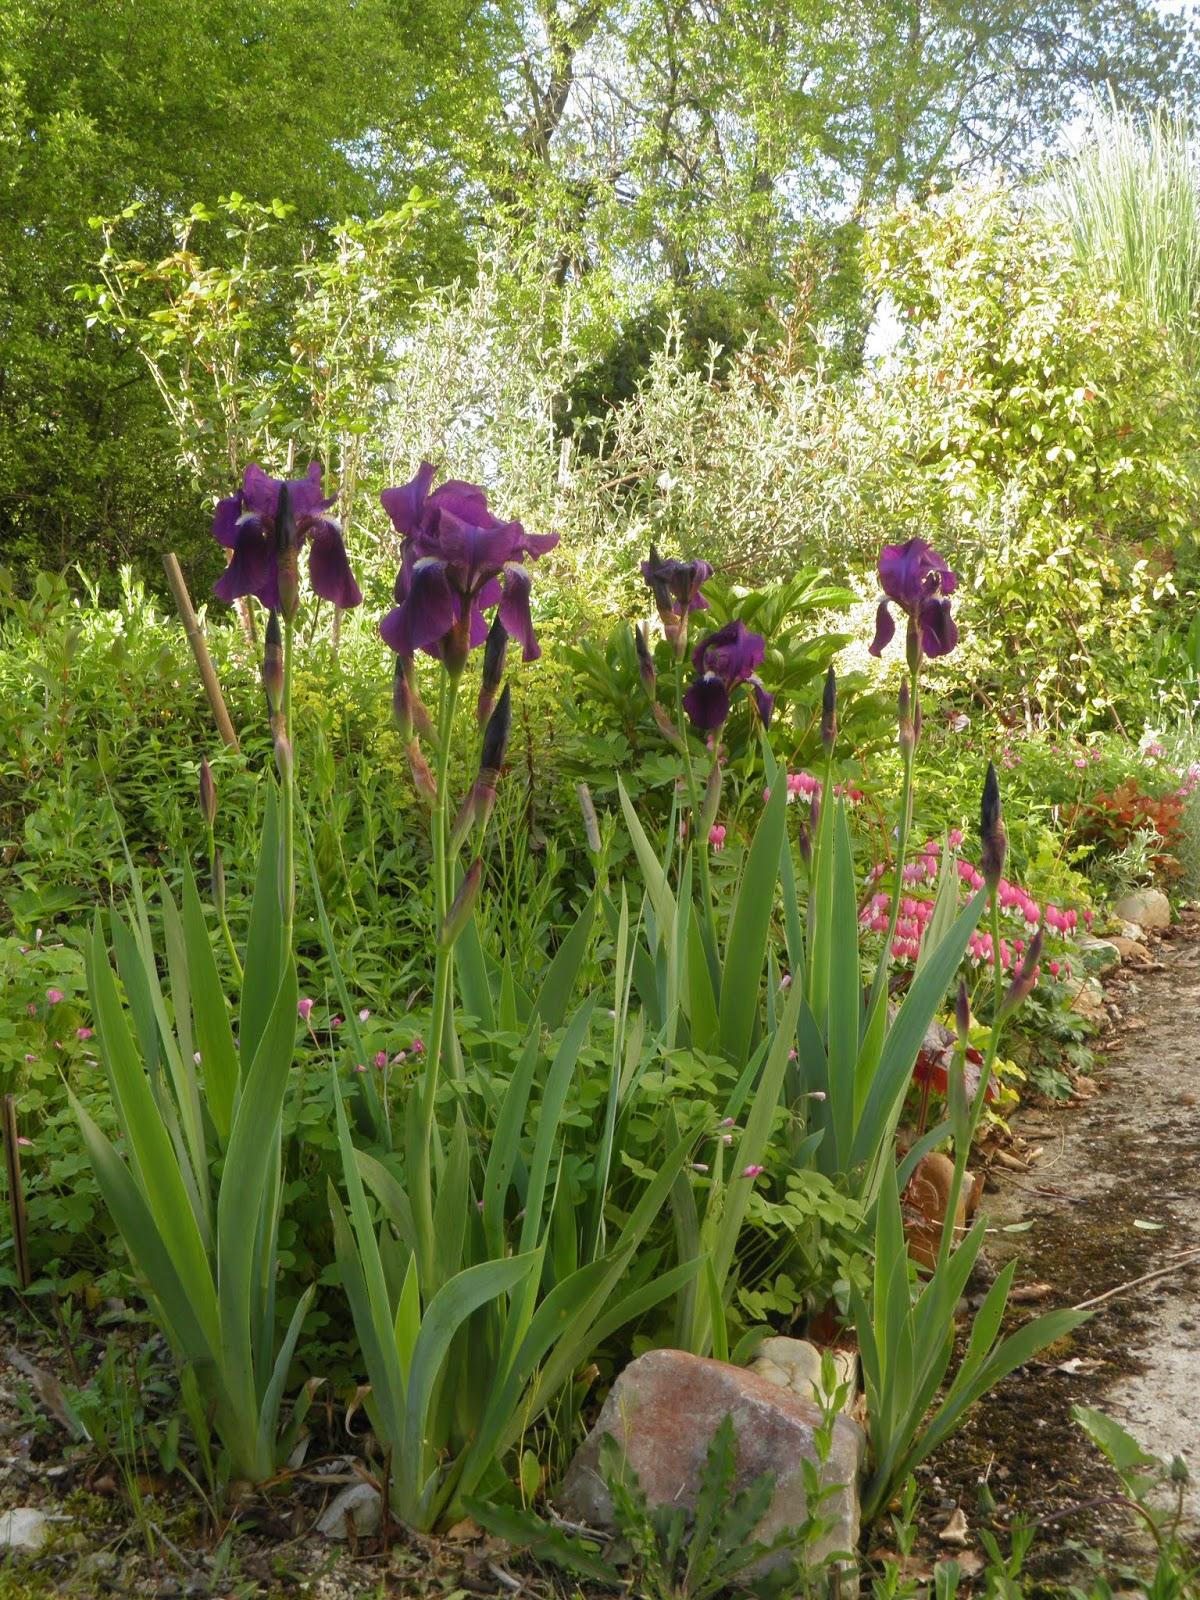 Mon Jardin En Avril mon jardin quercynois: avril 2019